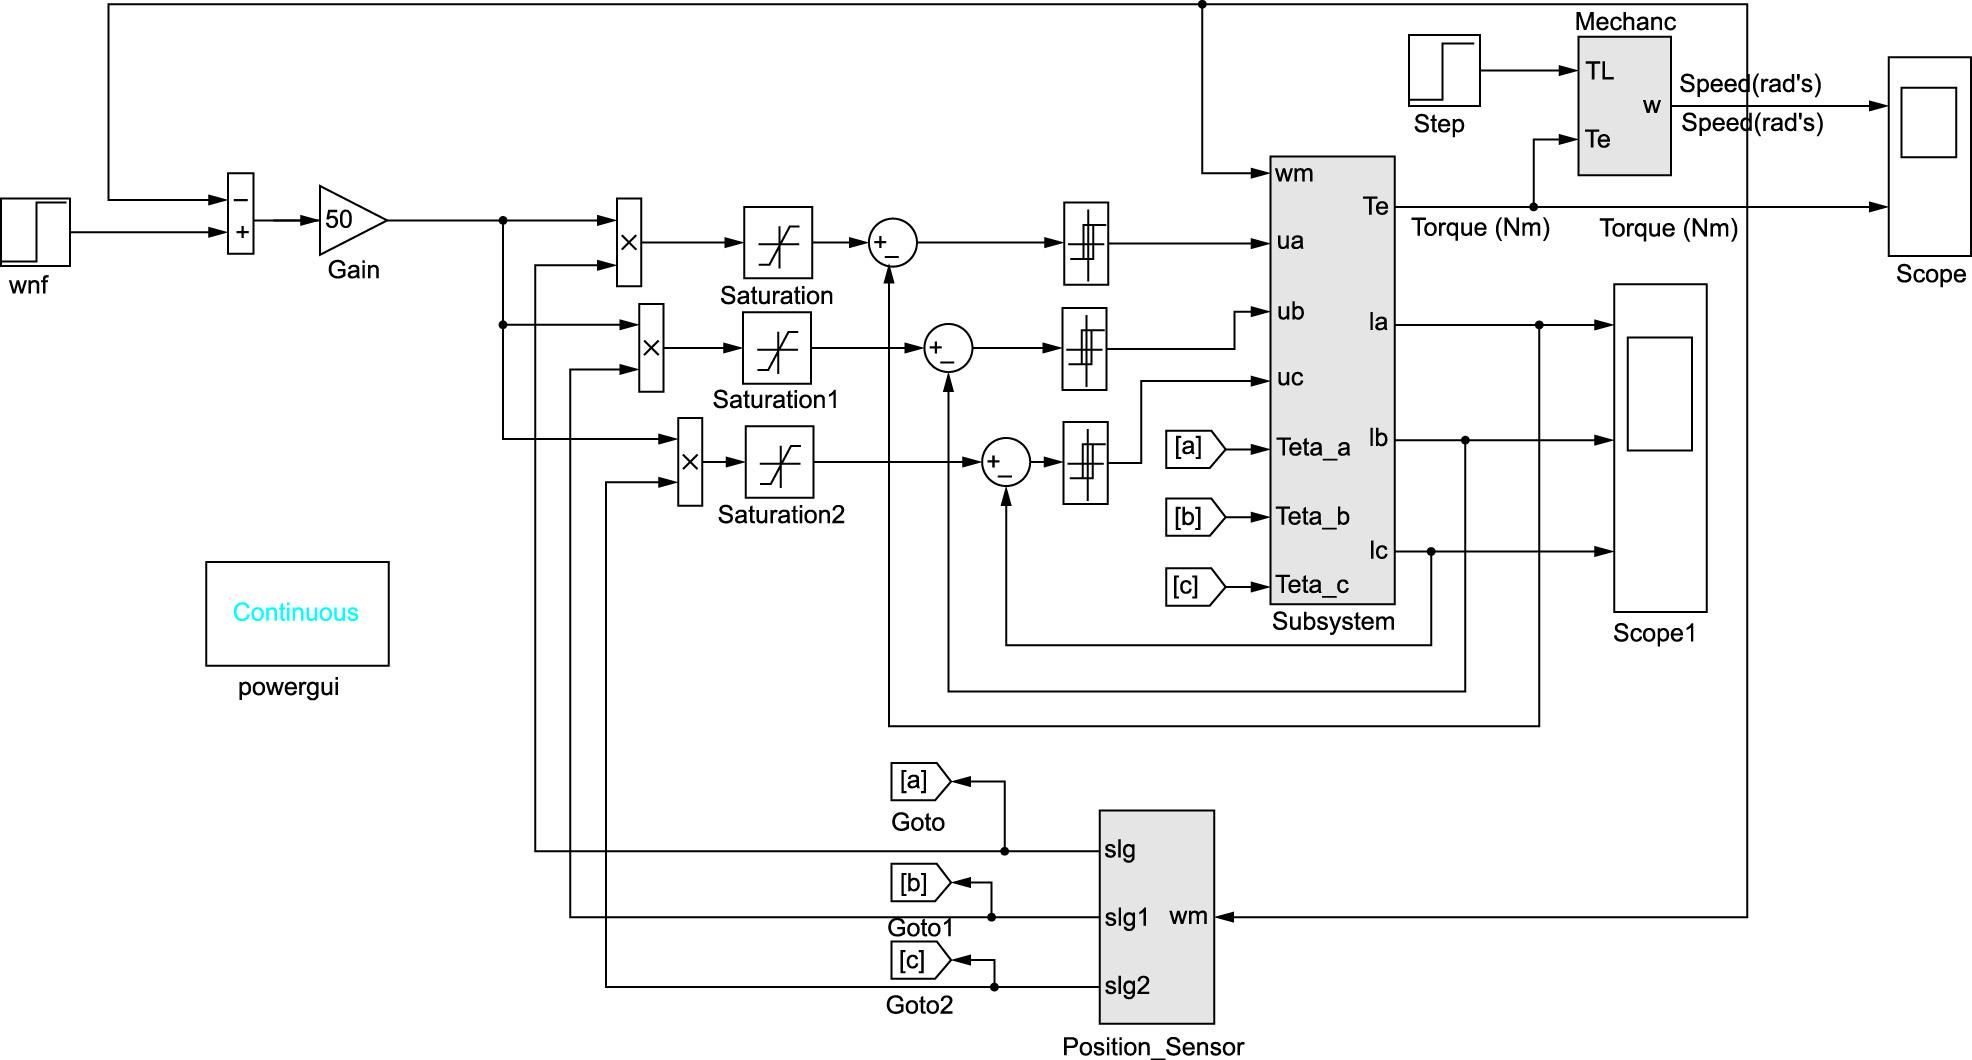 Модель электропривода с БДПТ